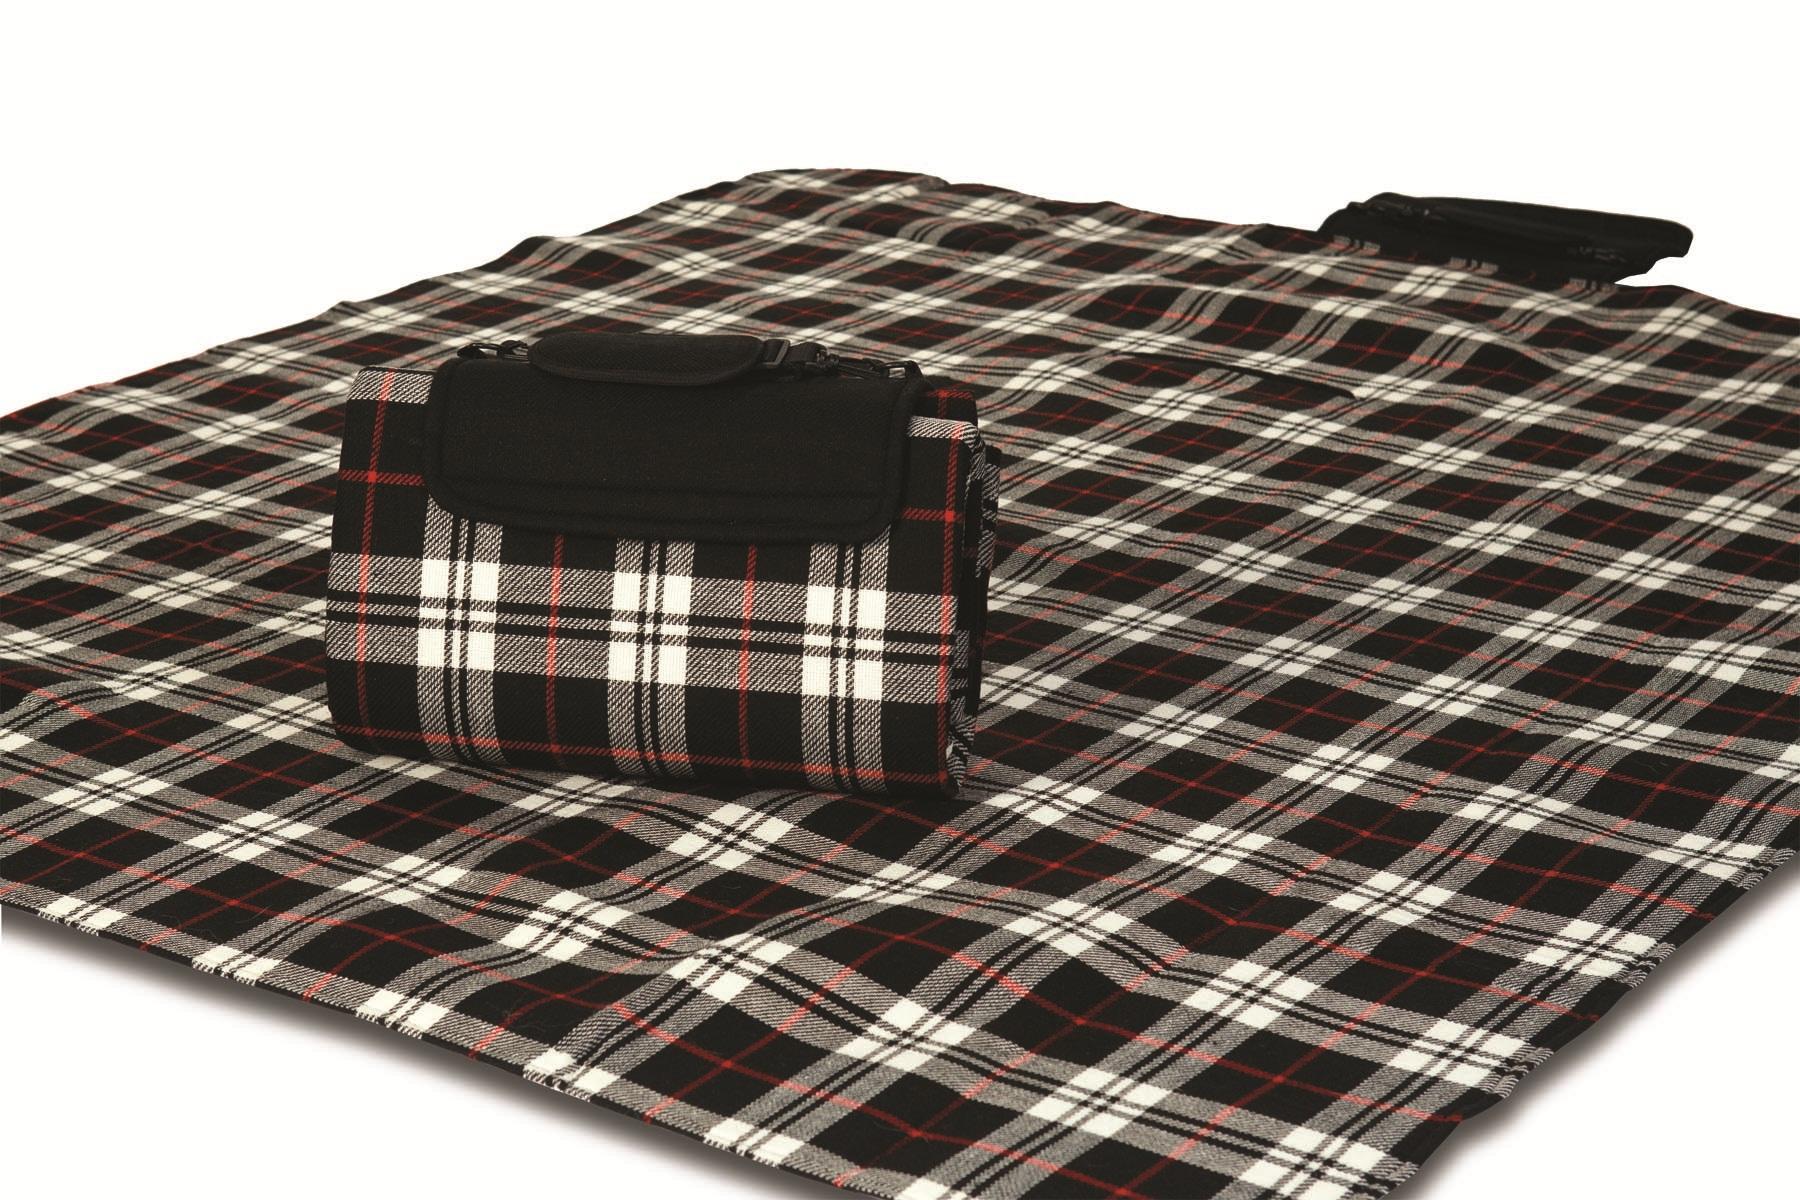 Picnic Rug Blanket Blankets Throws Ideas